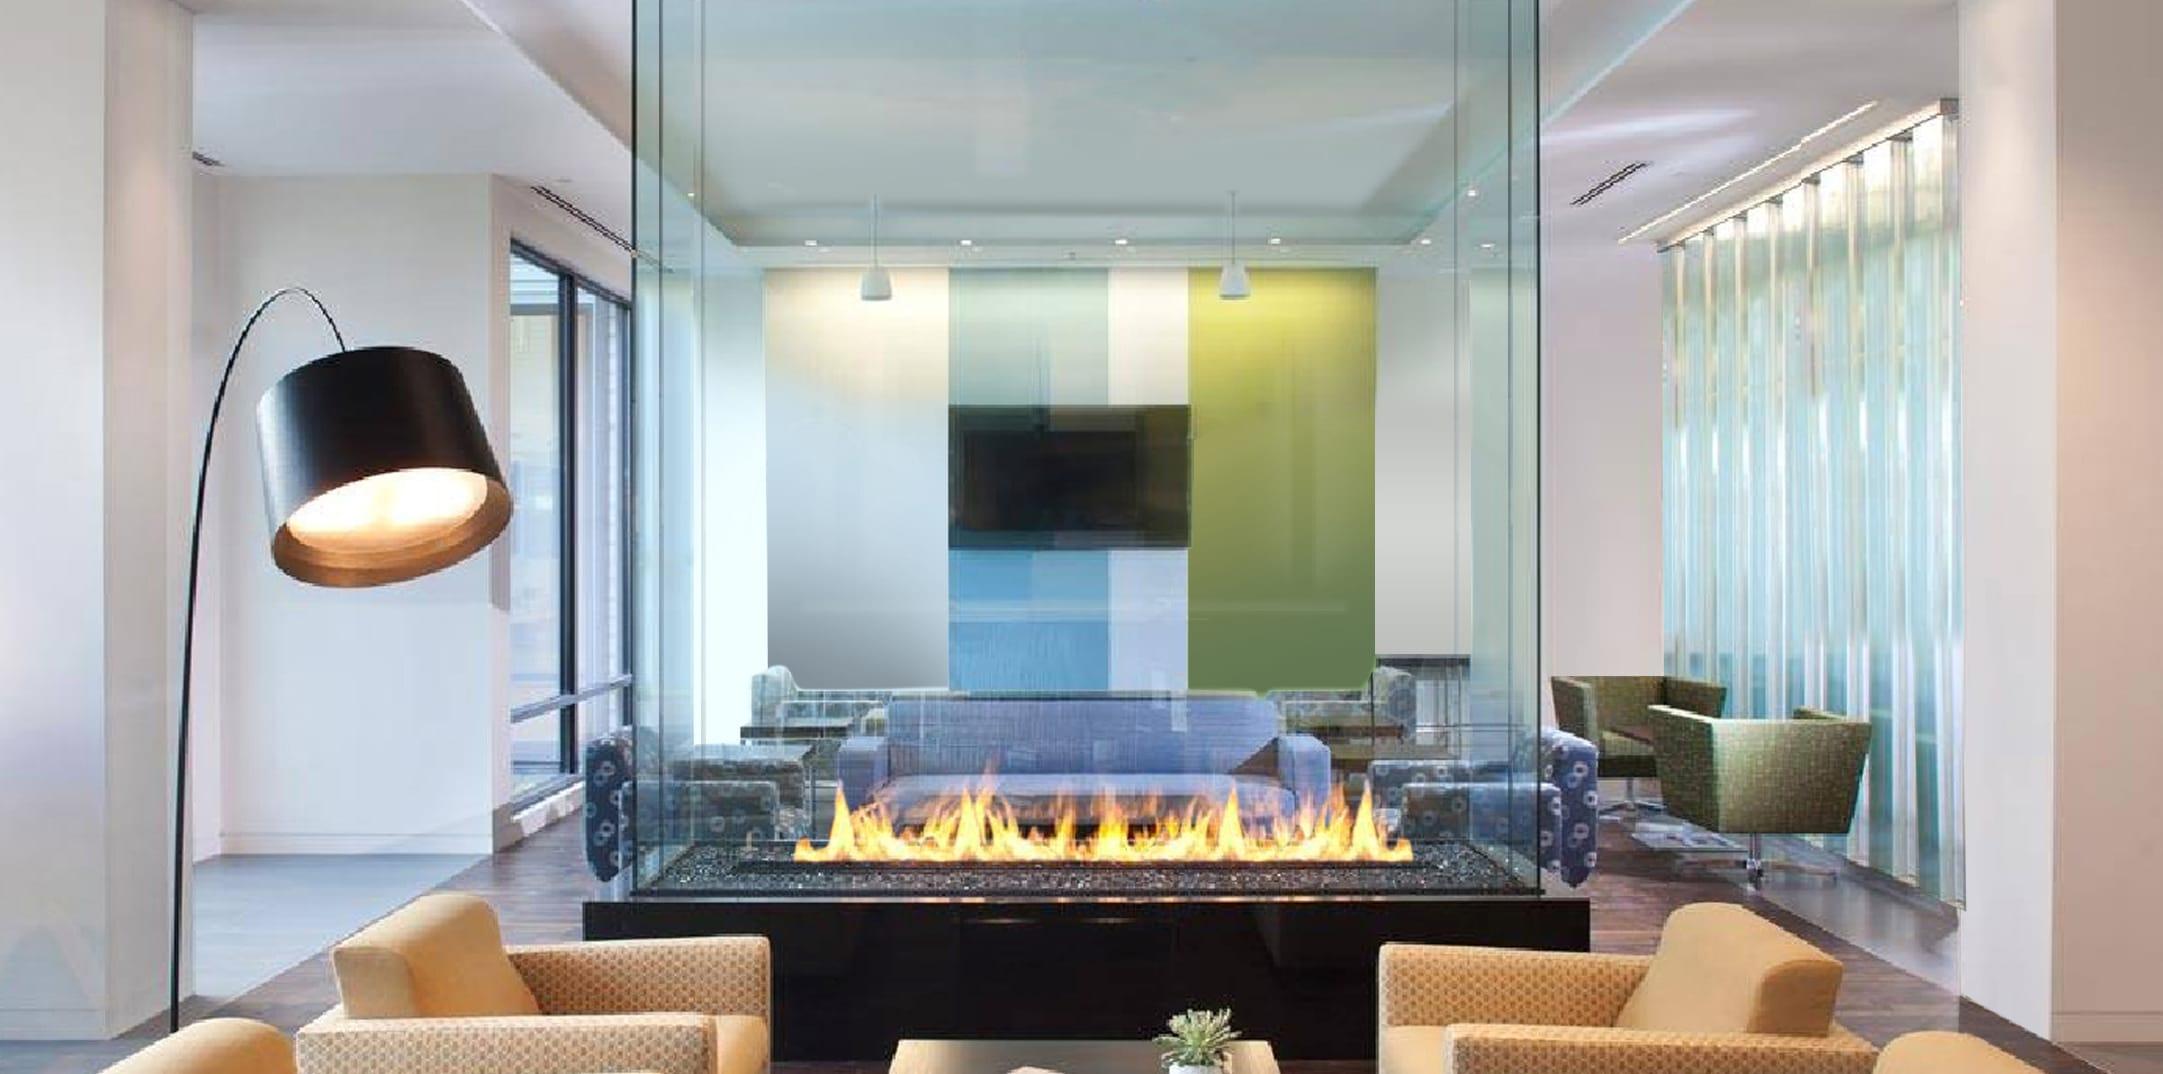 4 Sided Fireplace A Customer S Journey